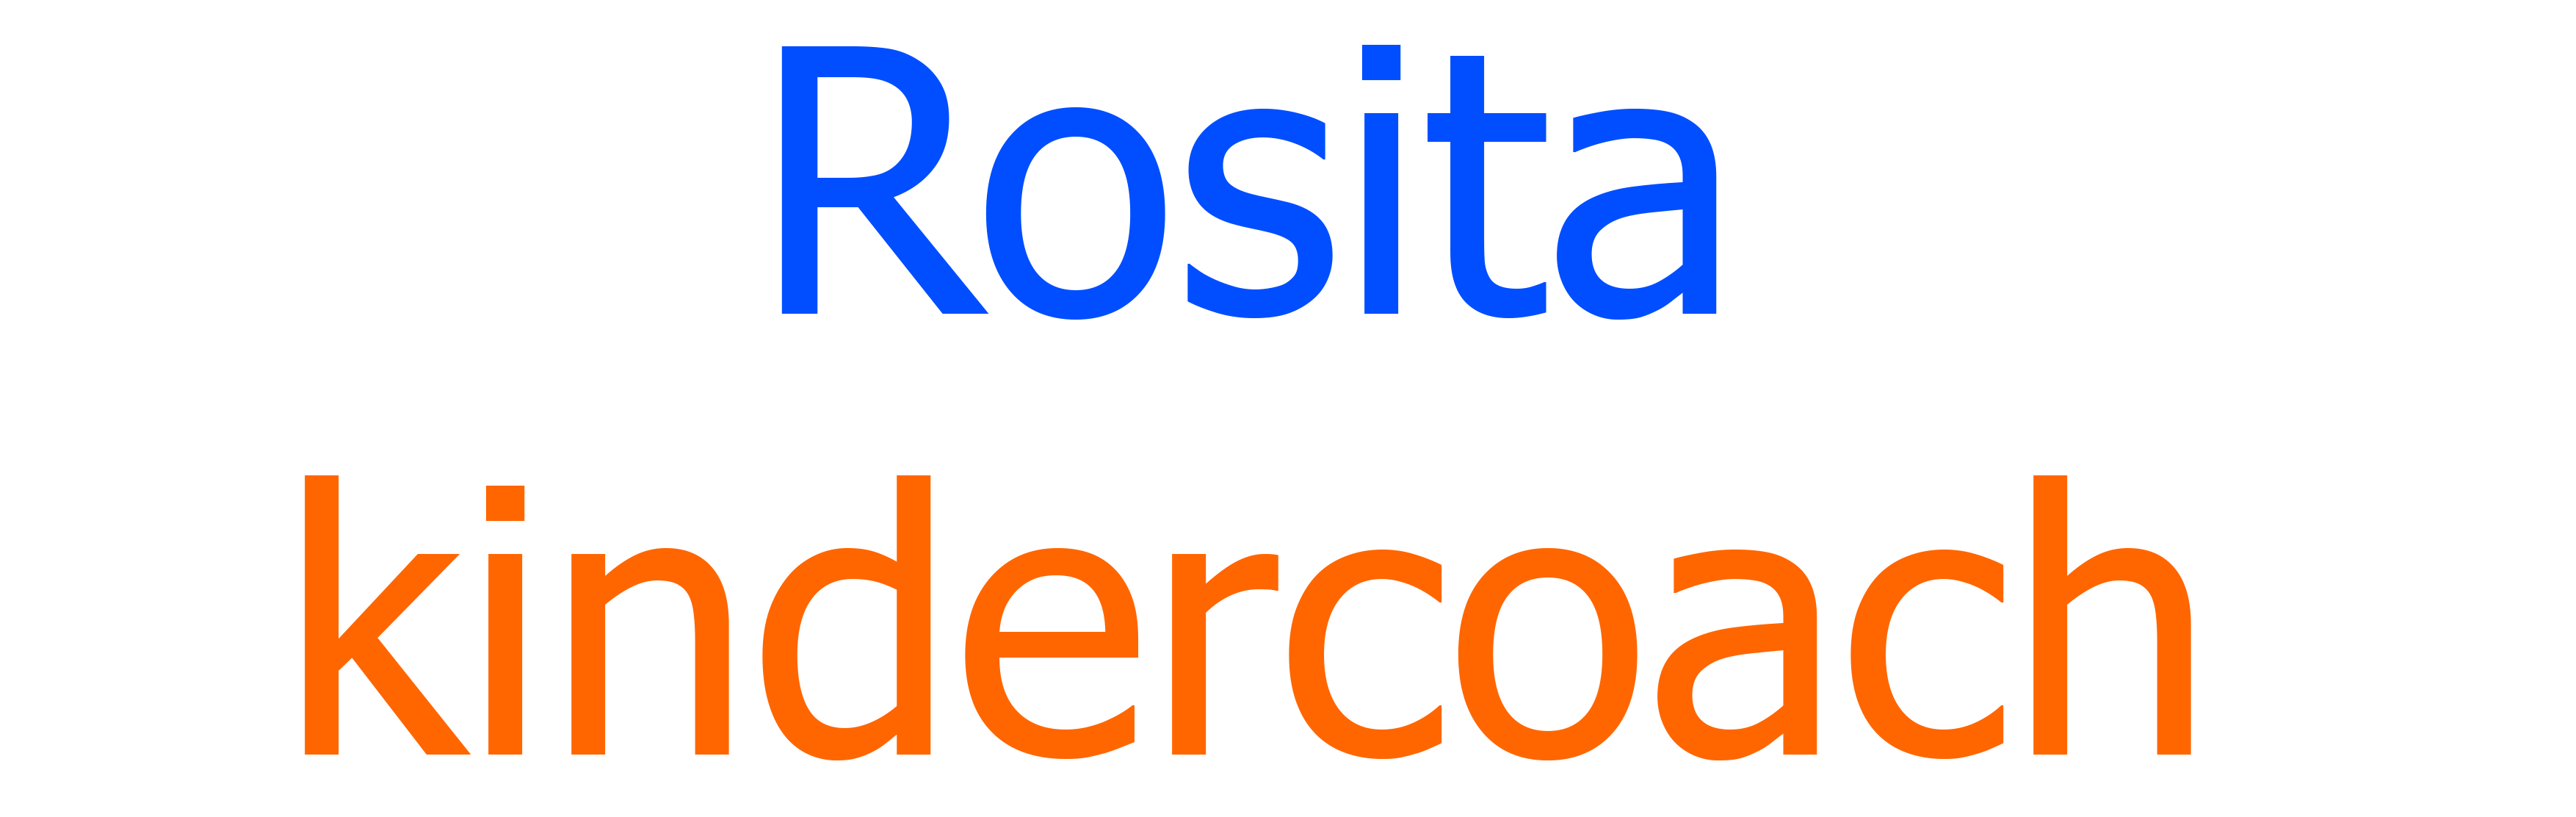 Rosita Kindercoach